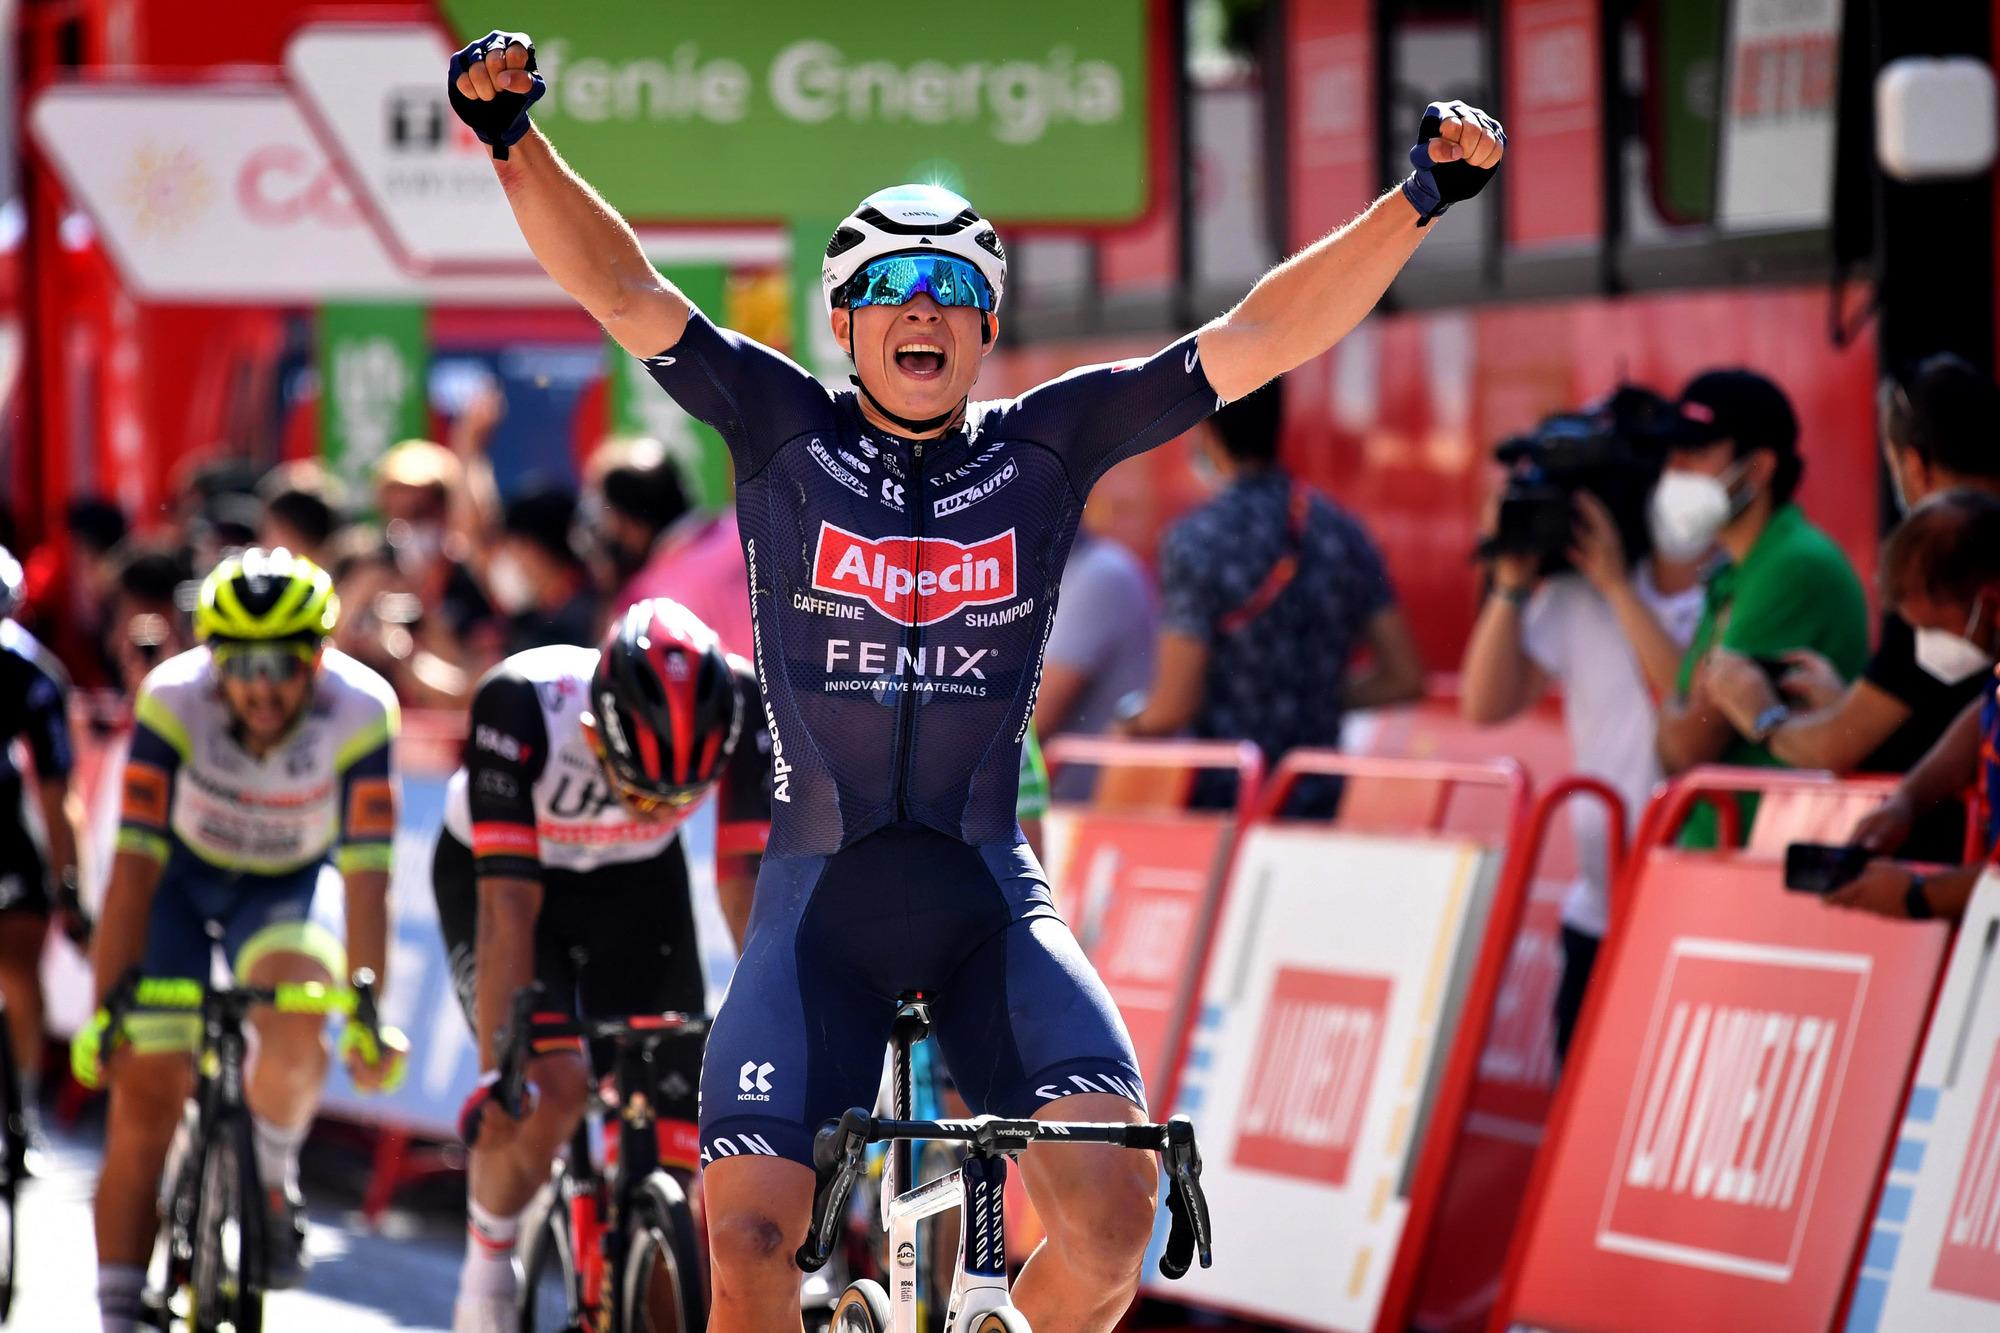 Vuelta Espana 2021 - 76th Edition - 2nd stage Caleruega - Burgos 166,7 km - 15/08/2021 - Jasper Philipsen (BEL - Alpecin-Fenix) - photo Miwa Iijima/CV/BettiniPhoto©2021